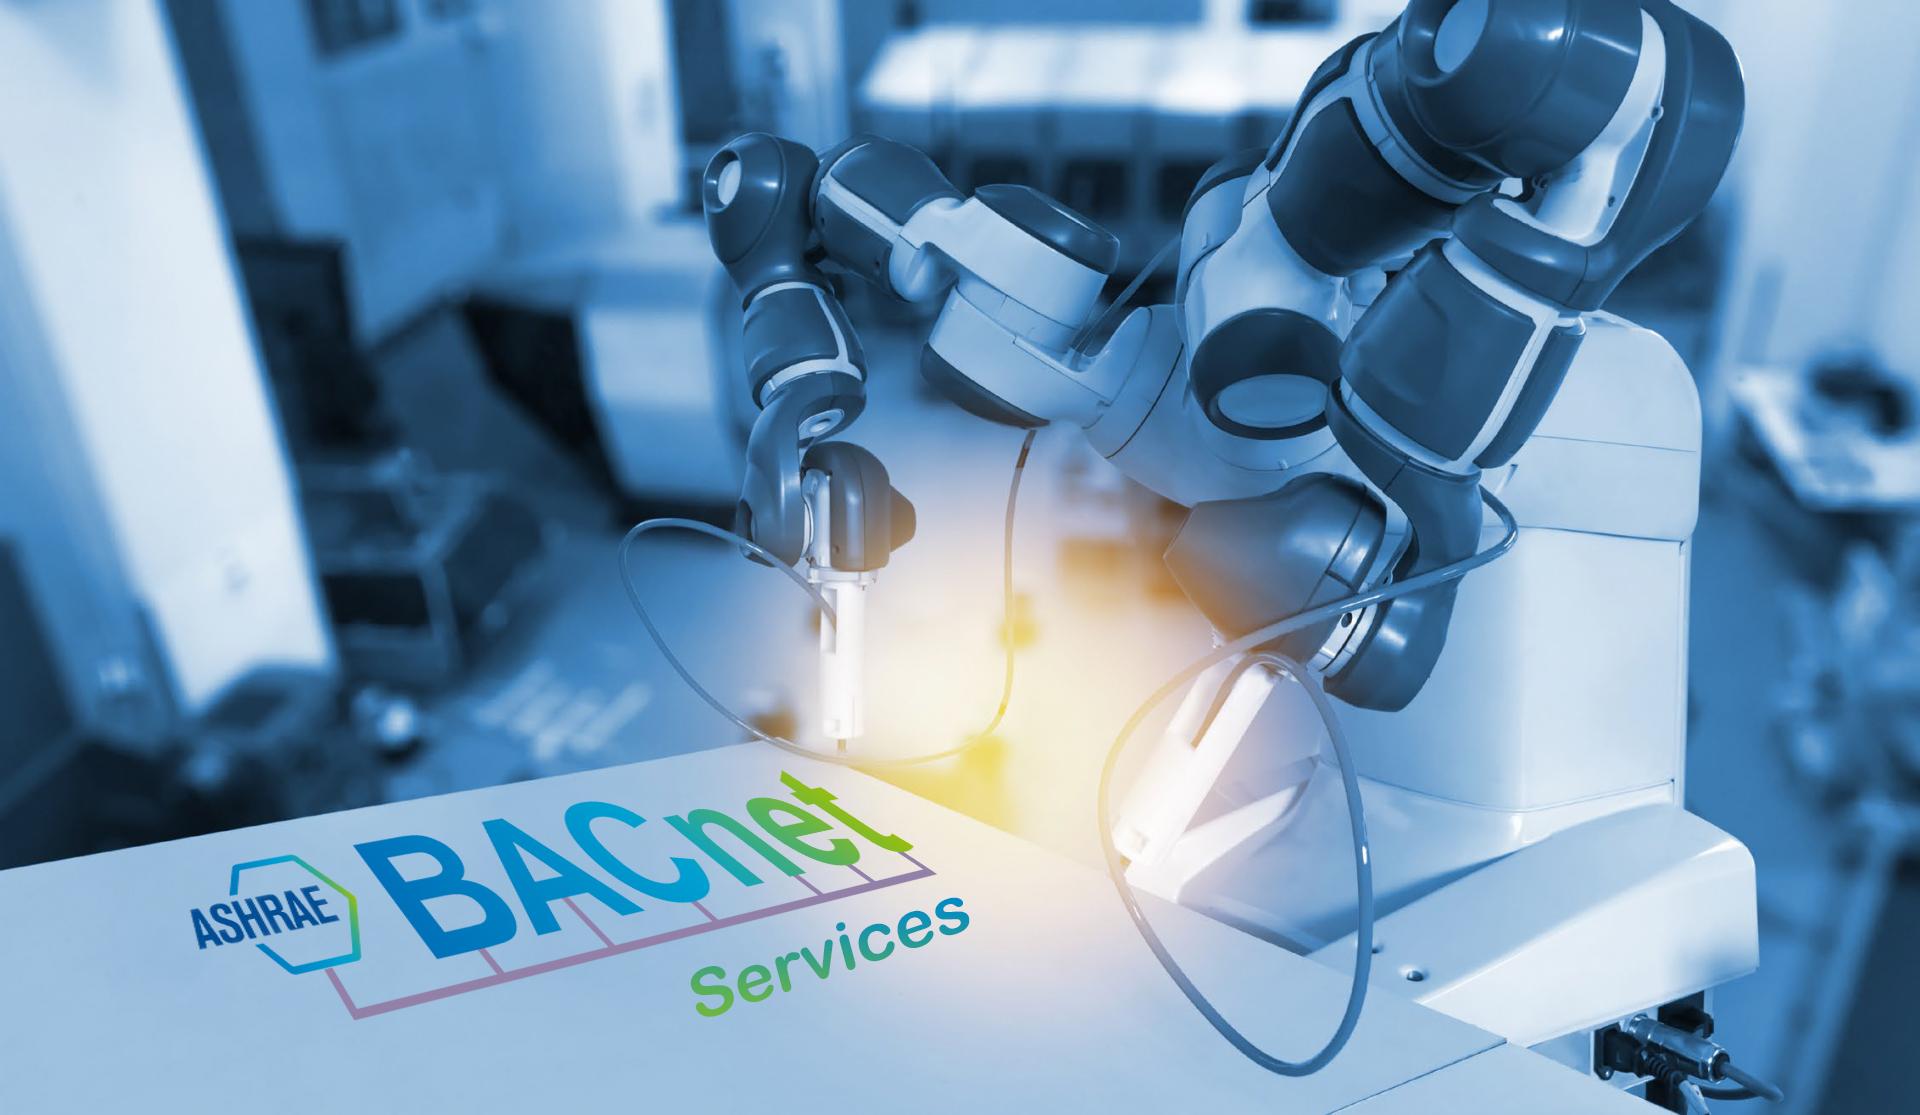 BACnet Services